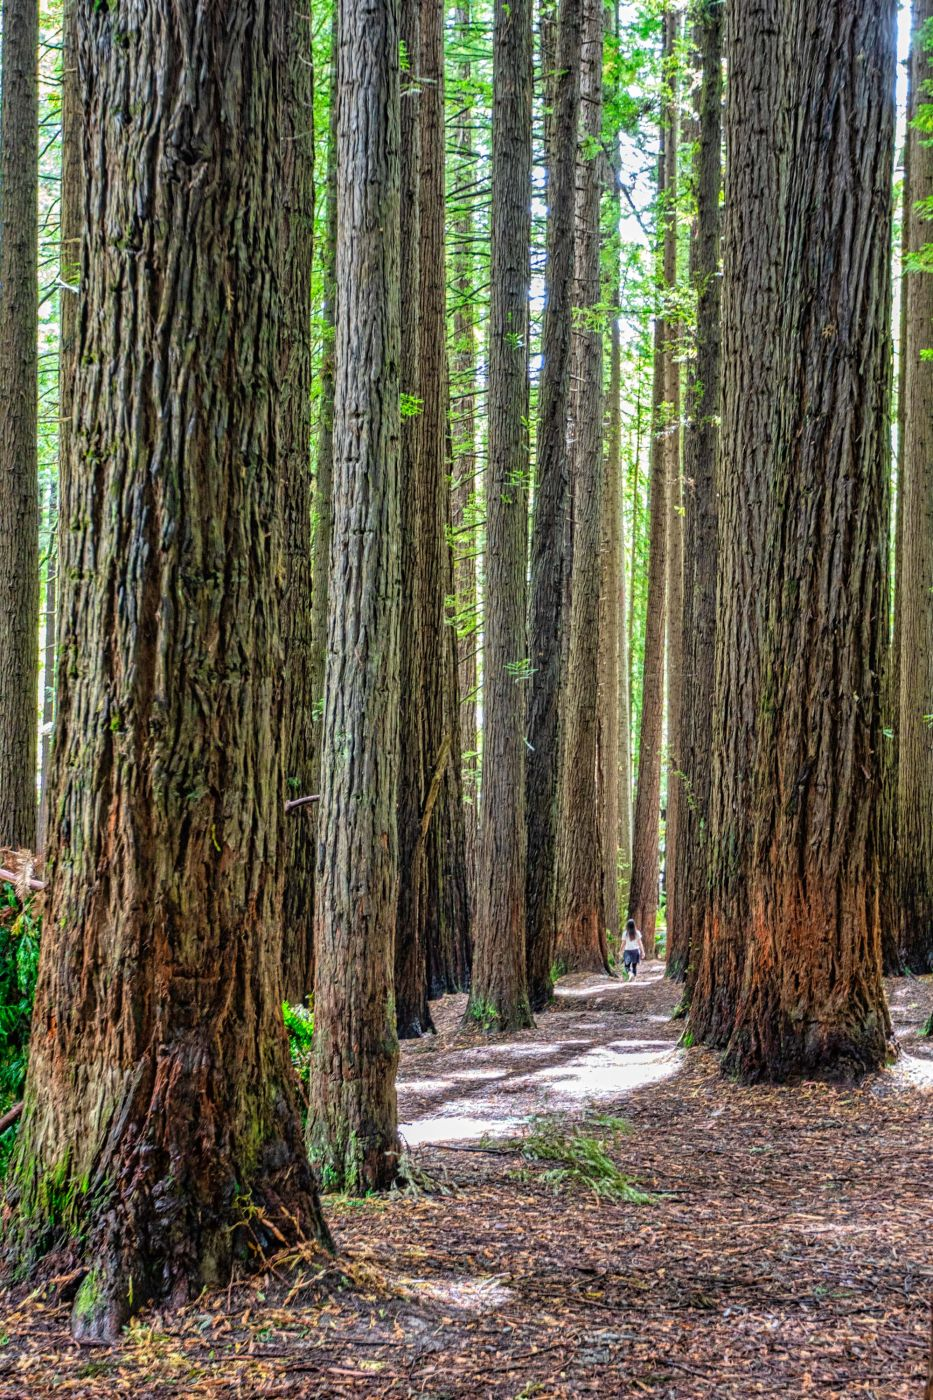 The Redwoods Otways, Beech Forest, Victoria, Australia